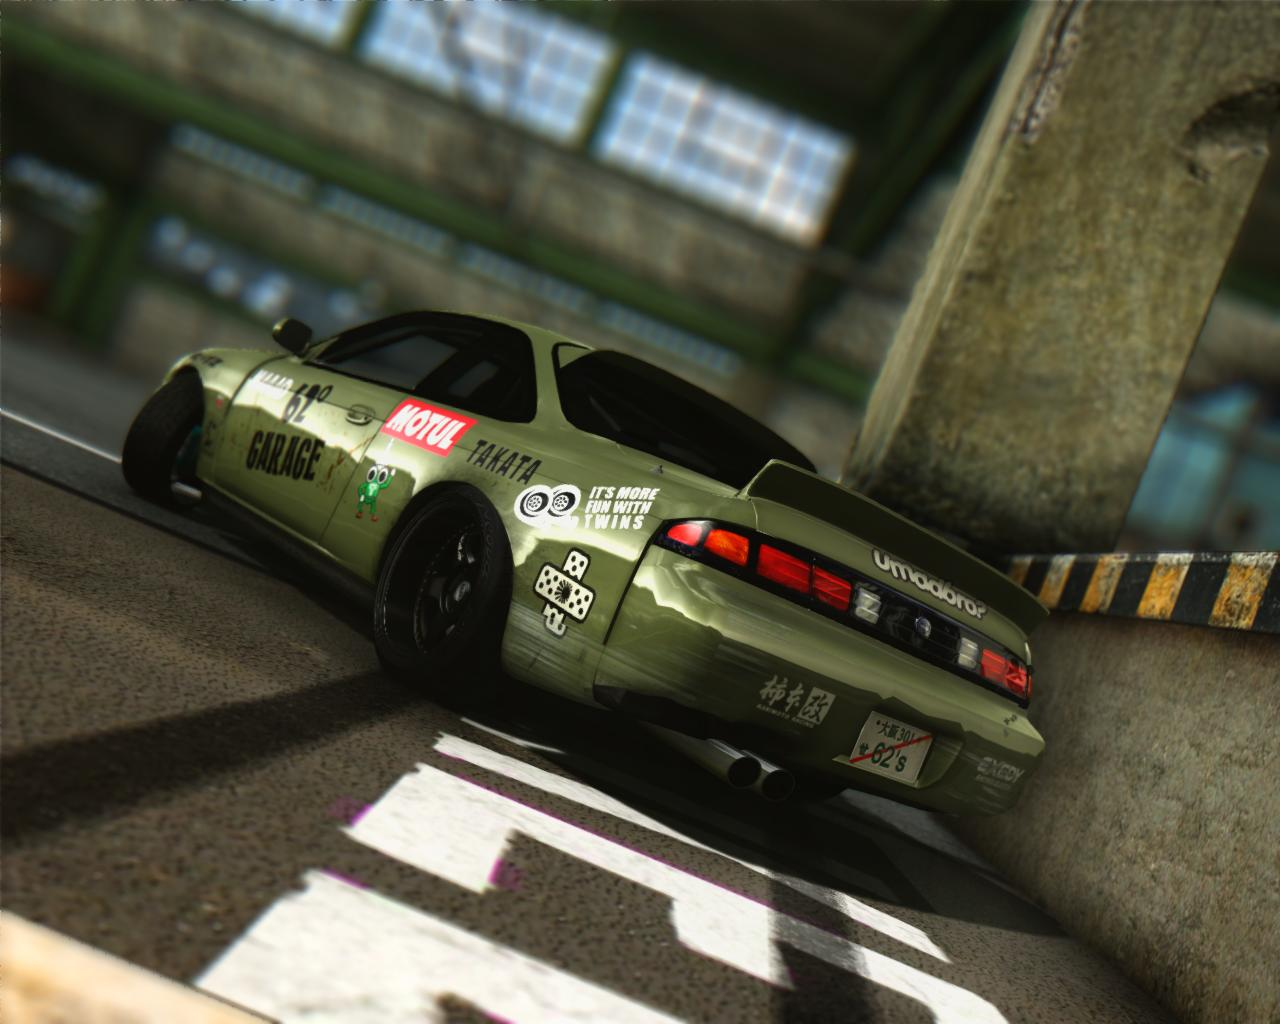 62's Garage Rfactor Drift Team